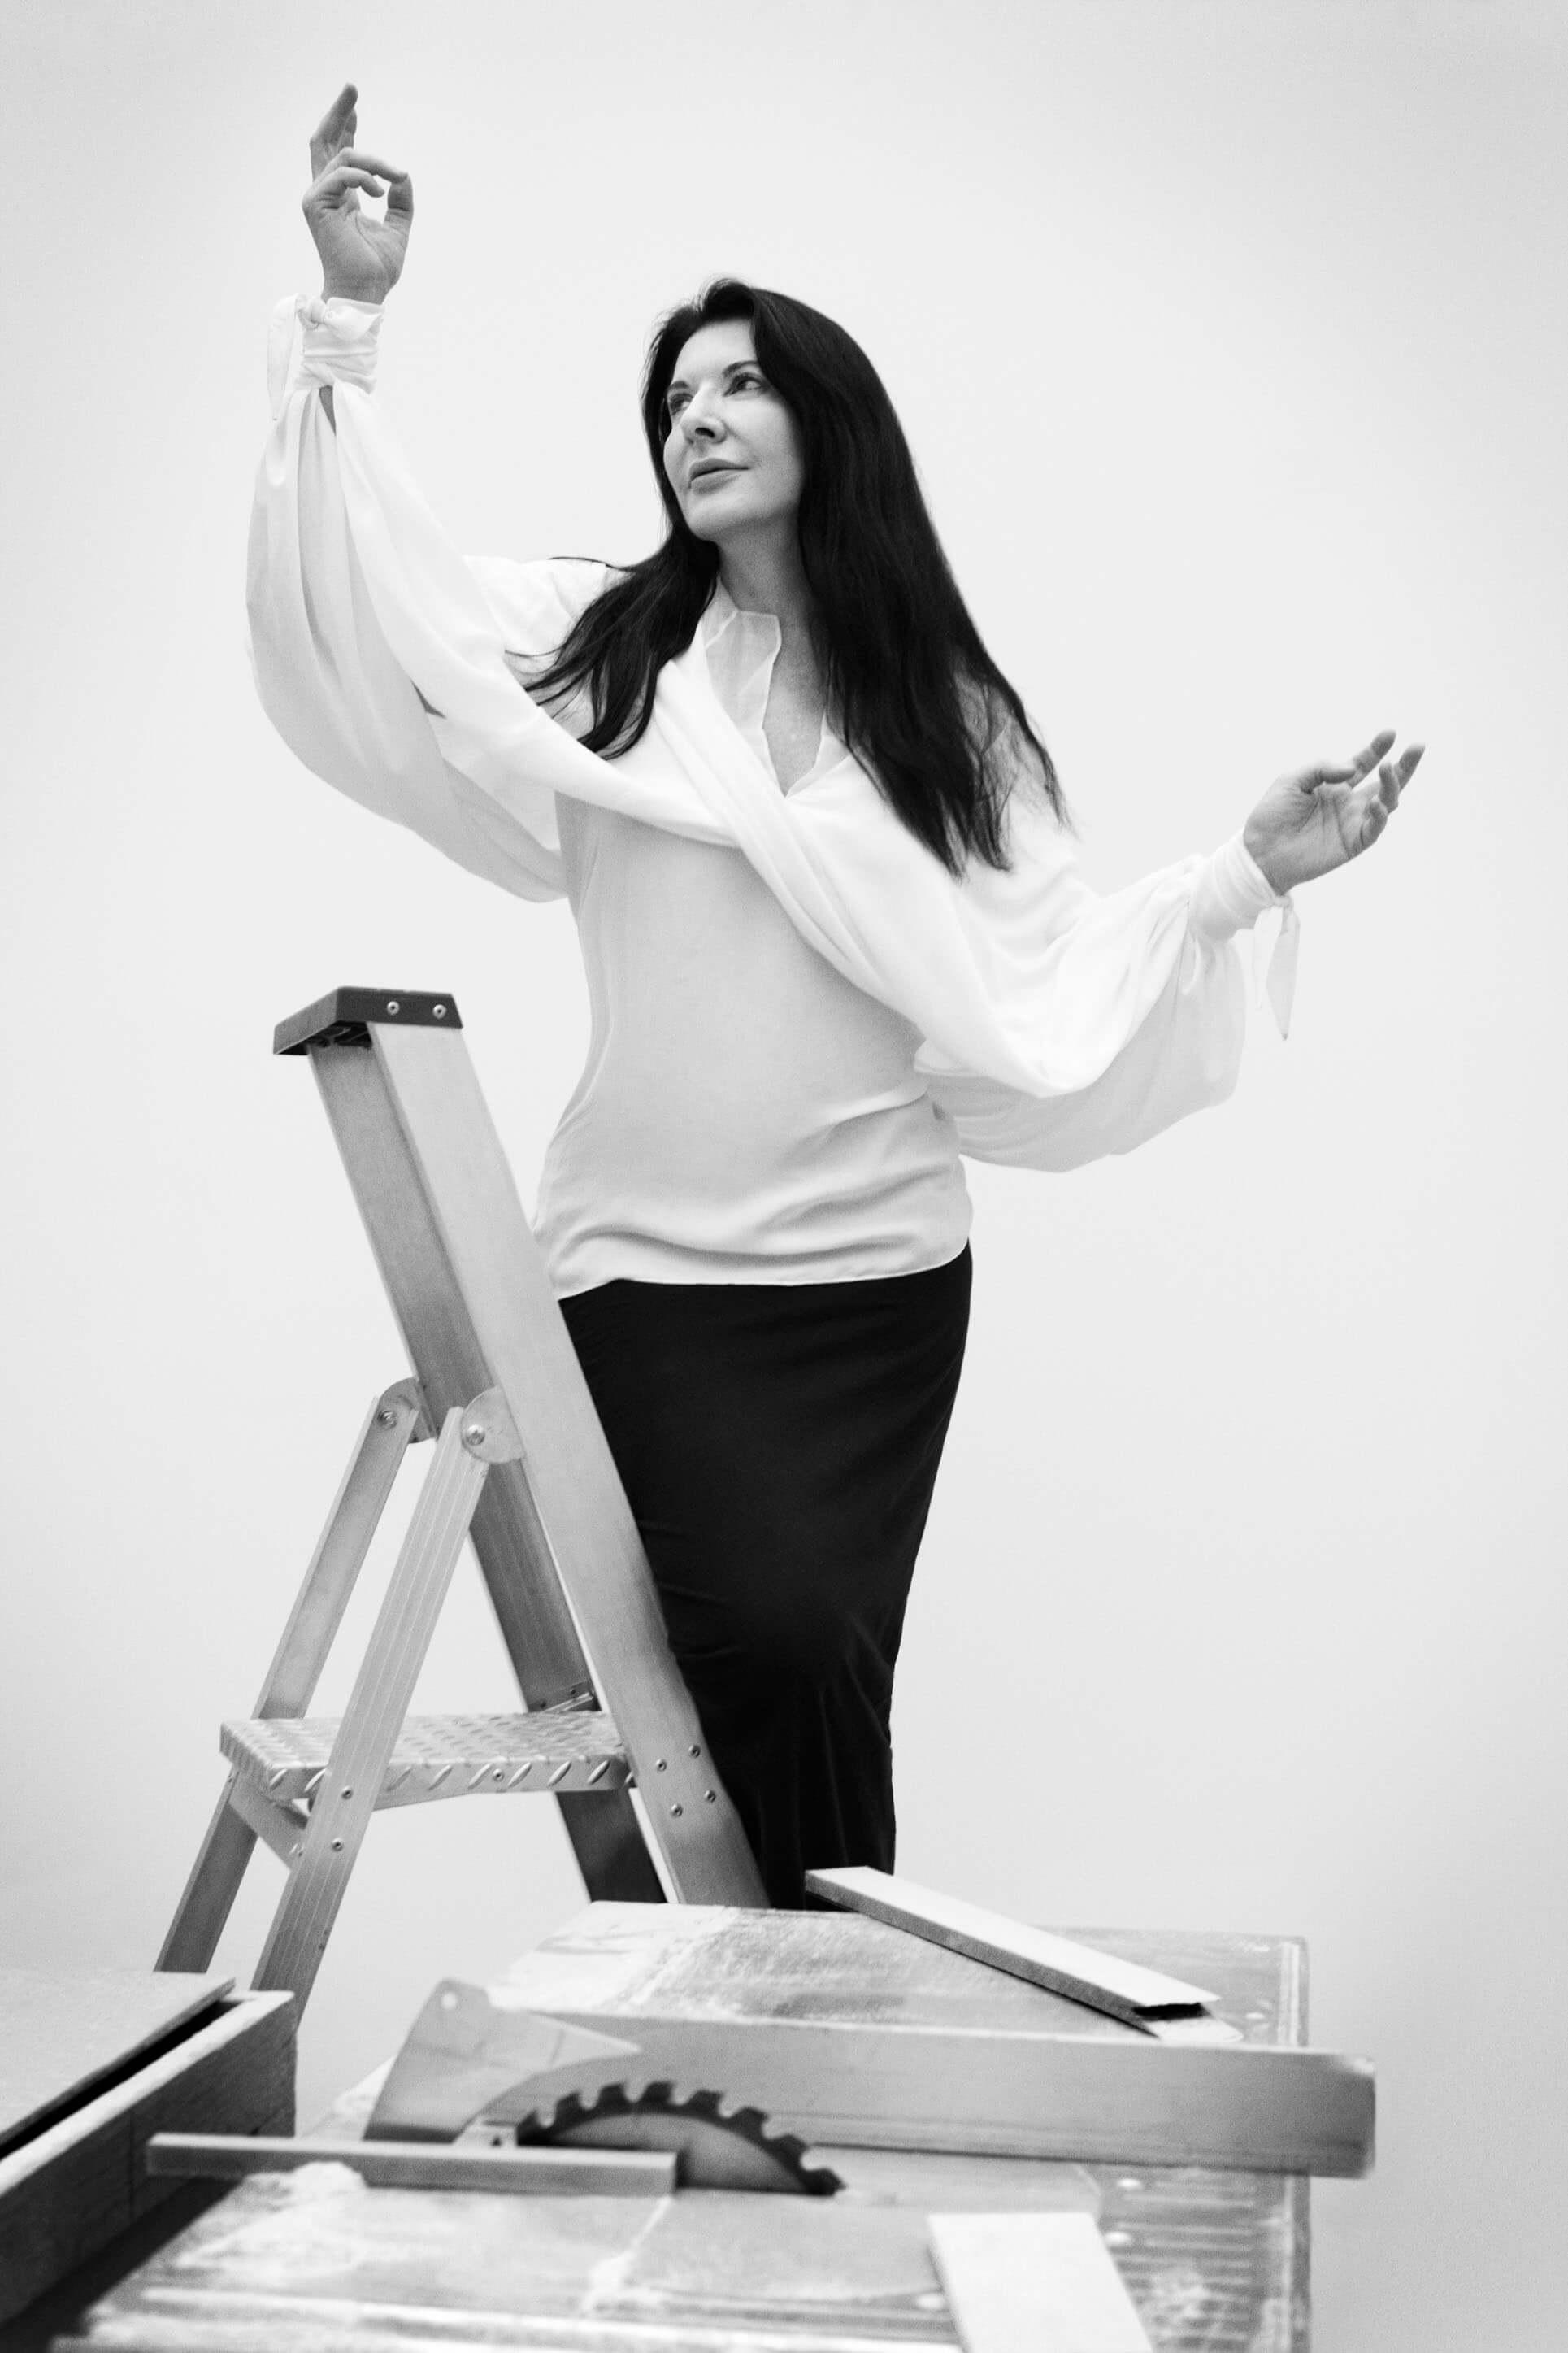 Marina Abramovic Numéro Magazine Editorial Ruth Bartlett Our Bartlett Styling